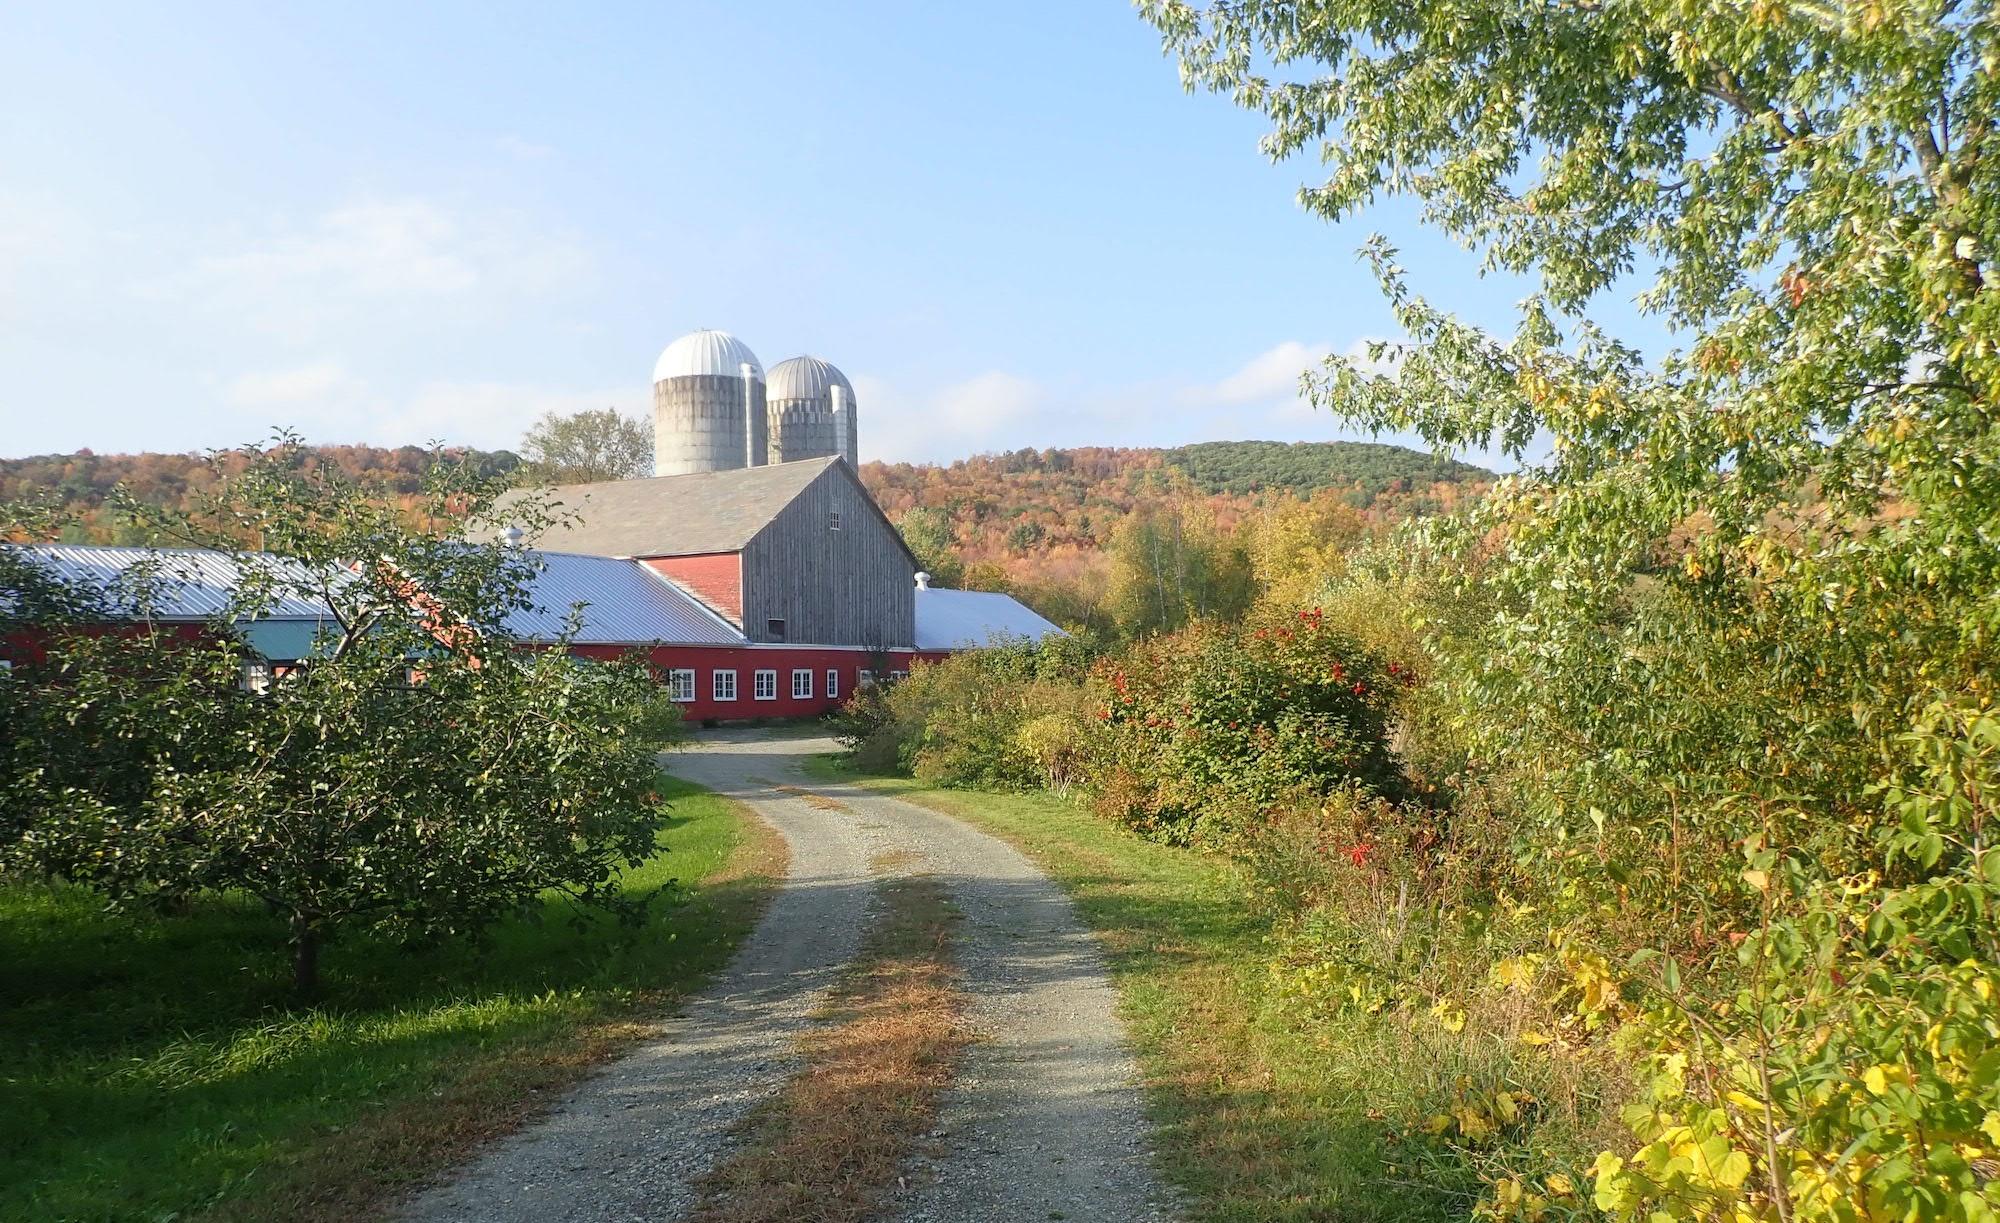 Farm+Between+Driveway.jpg